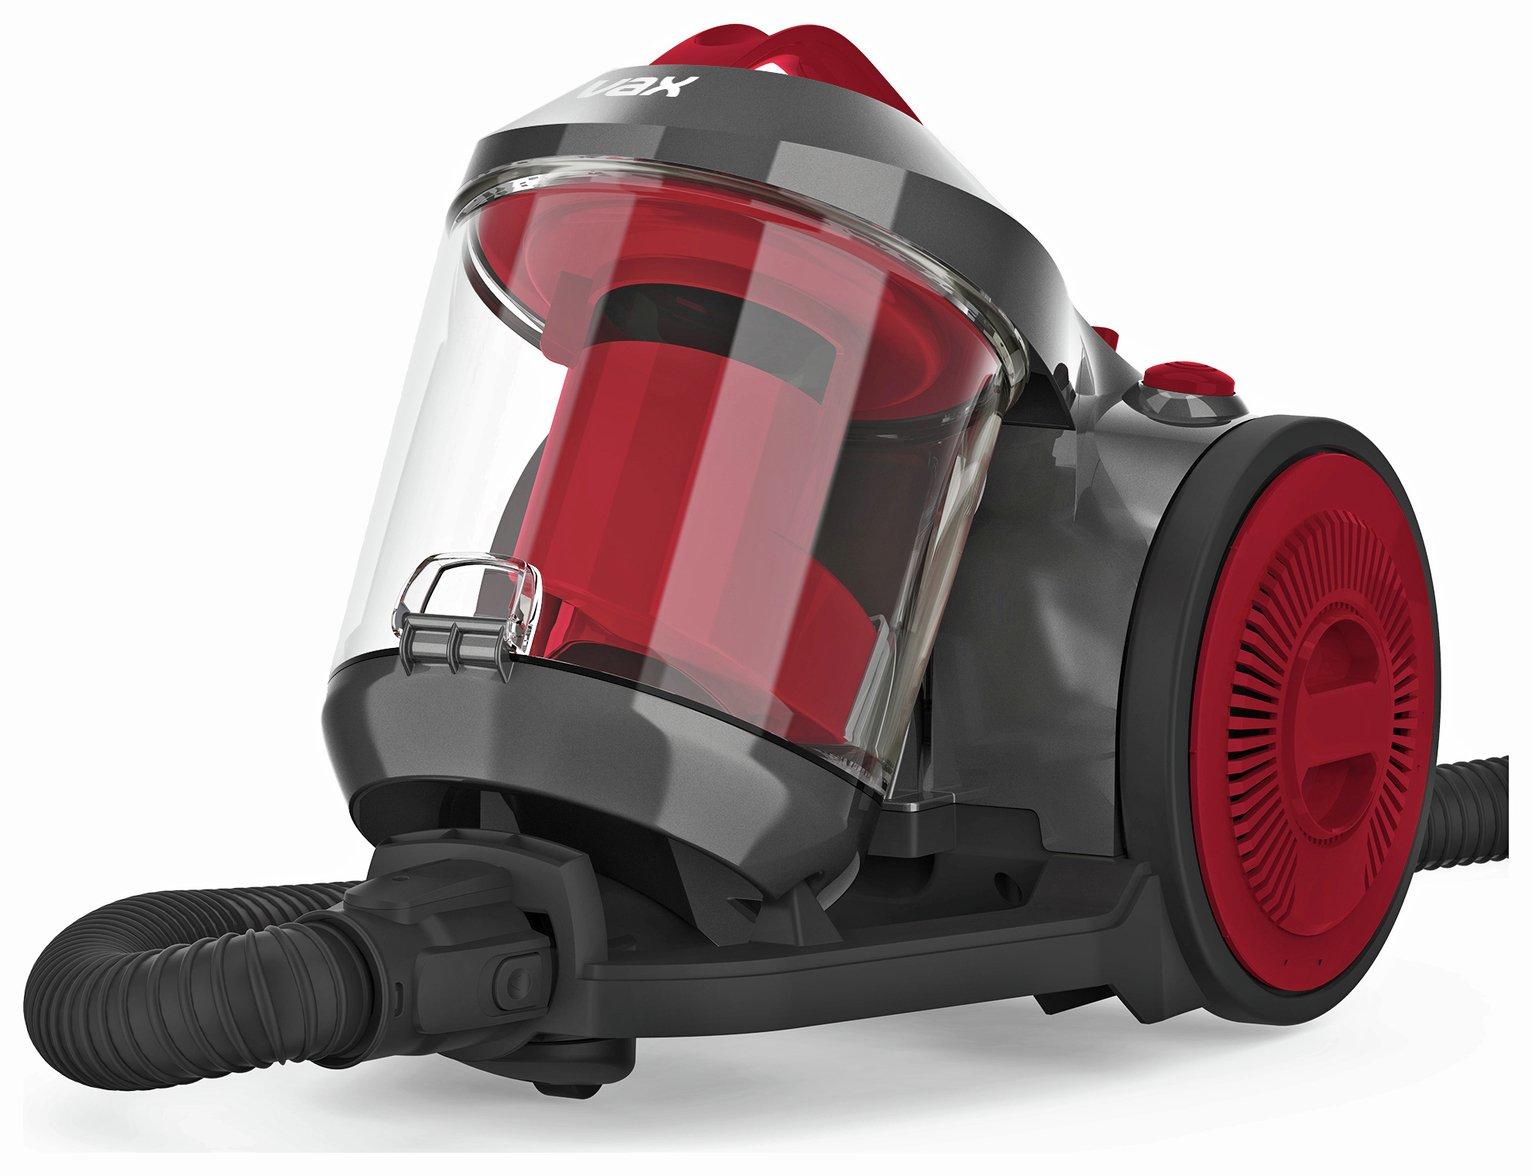 'Vax - Power Revive Bagless Cylinder Vacuum Cleaner-ccmbpnv1t1